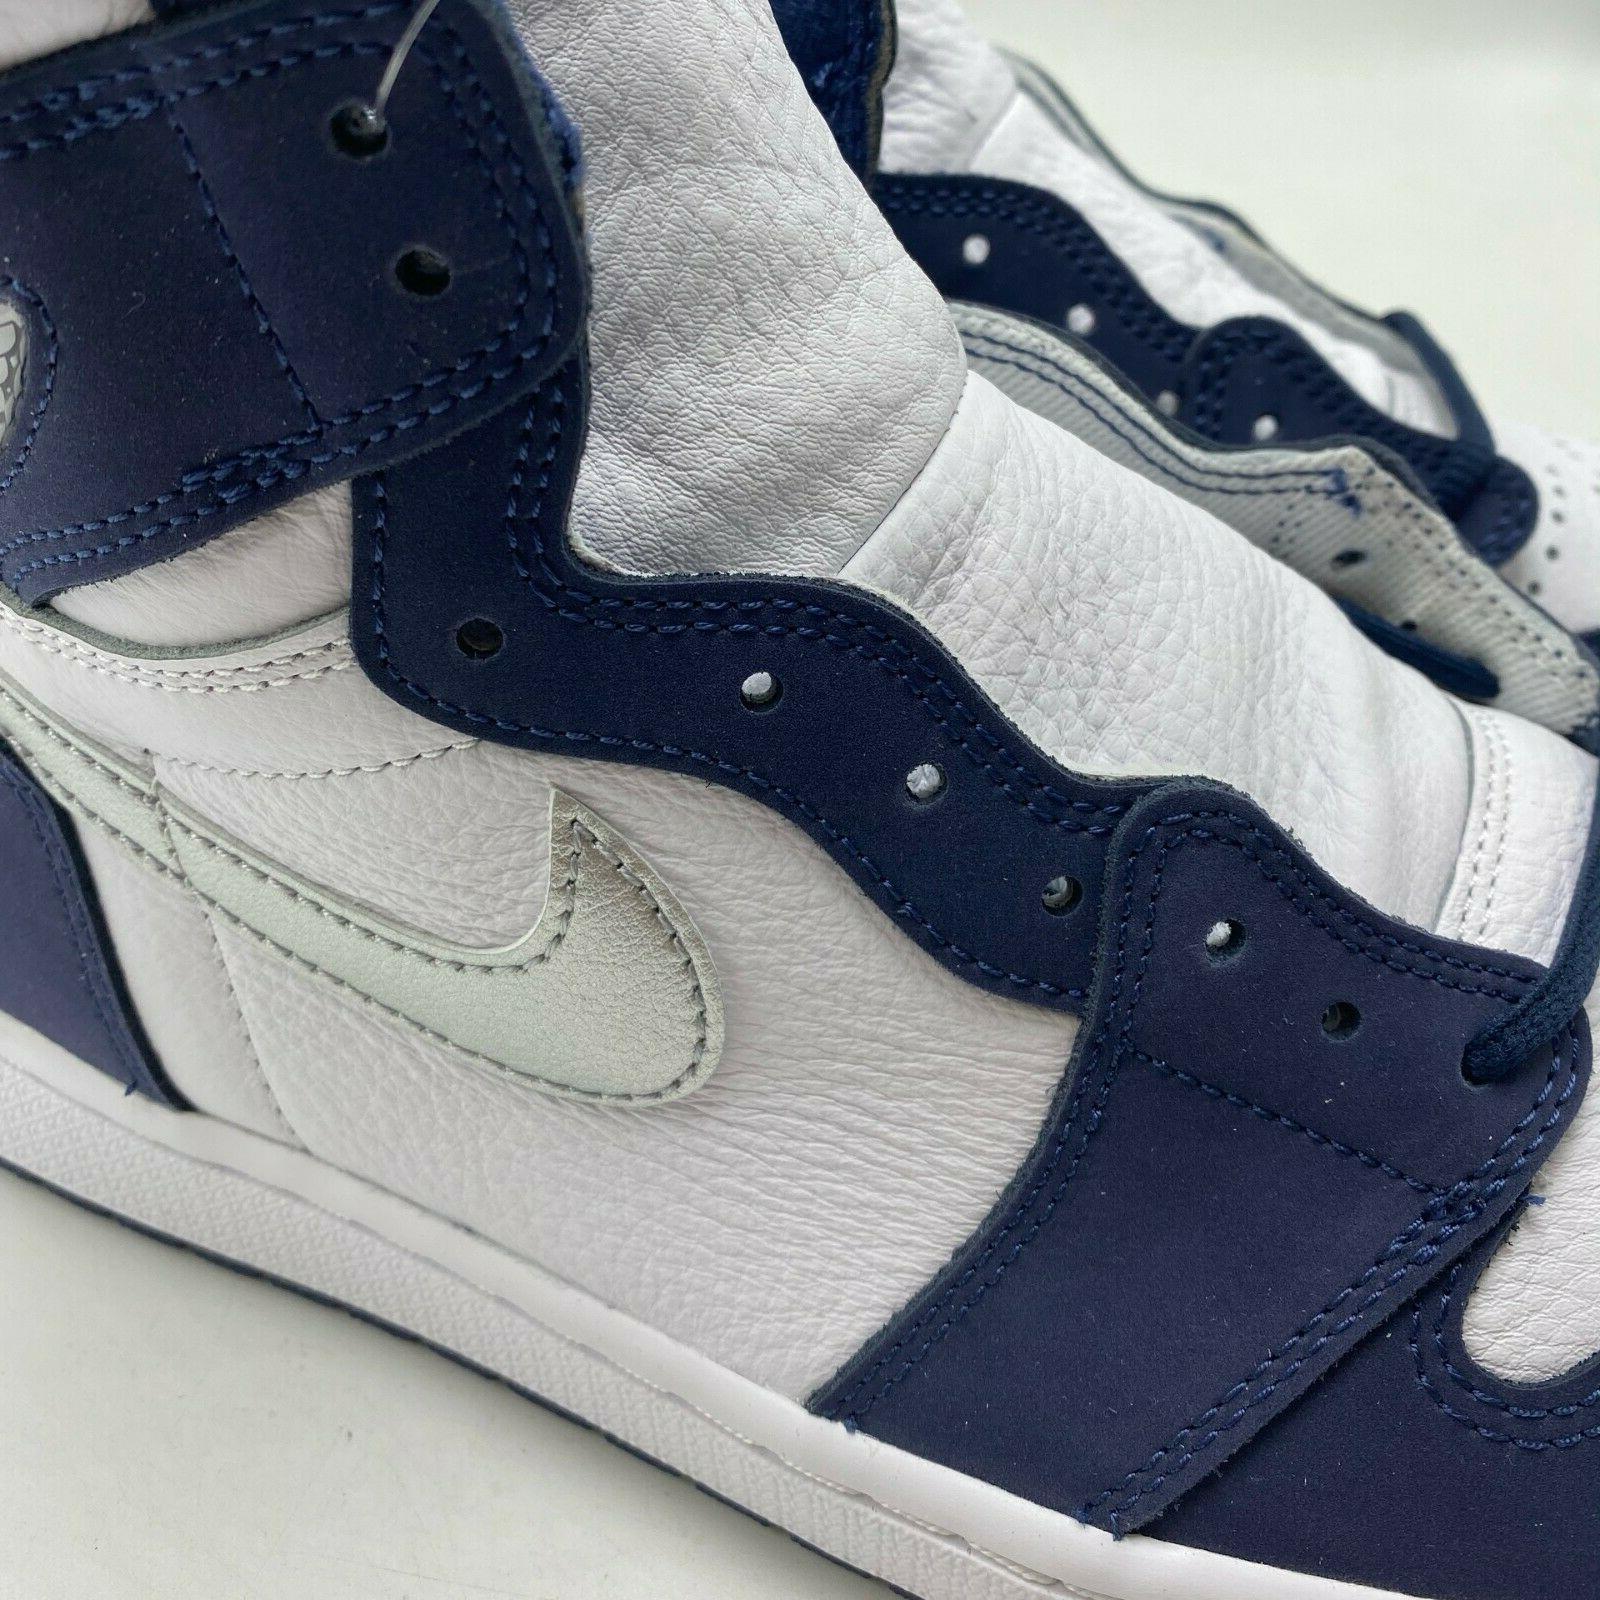 Air Jordan High OG CO Men's Shoes Navy DC1788-100